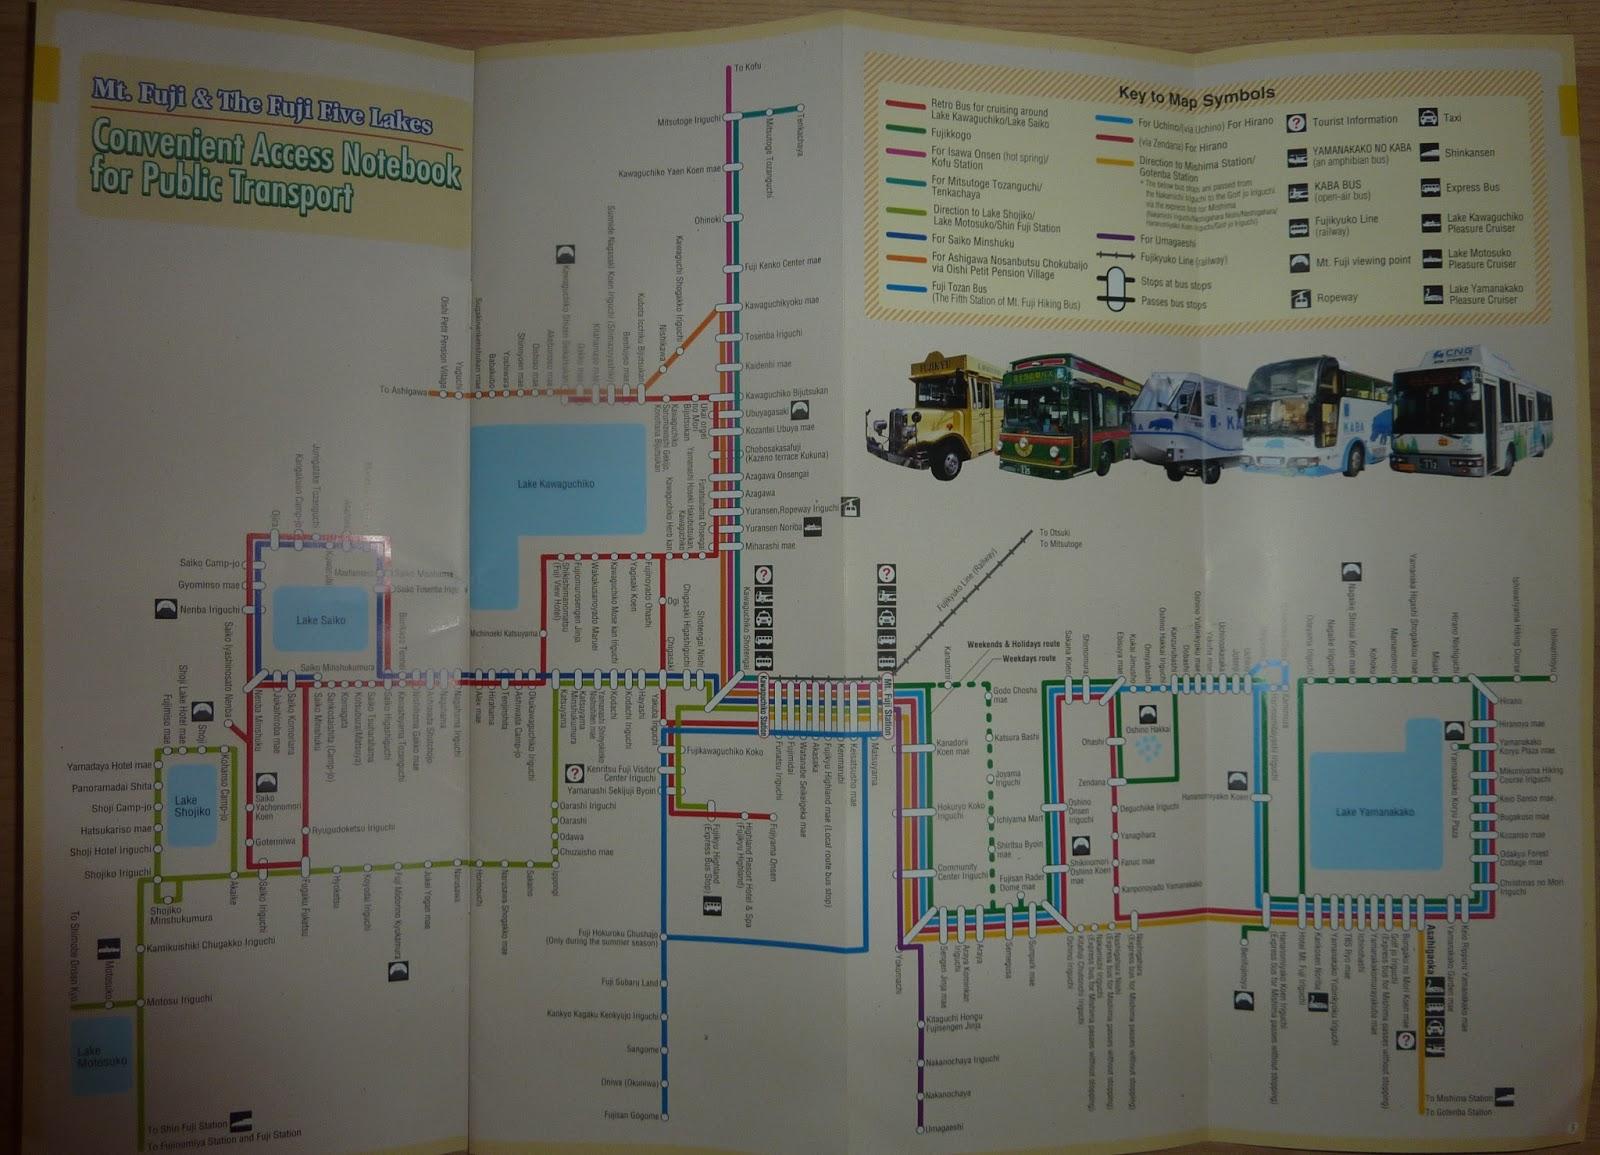 Mushingo Trip To Japan Day 3 Kawaguchiko Yama Wiring Diagram Katchi Ropeway Combo Deal Information Reverse Pamphlet Ticket